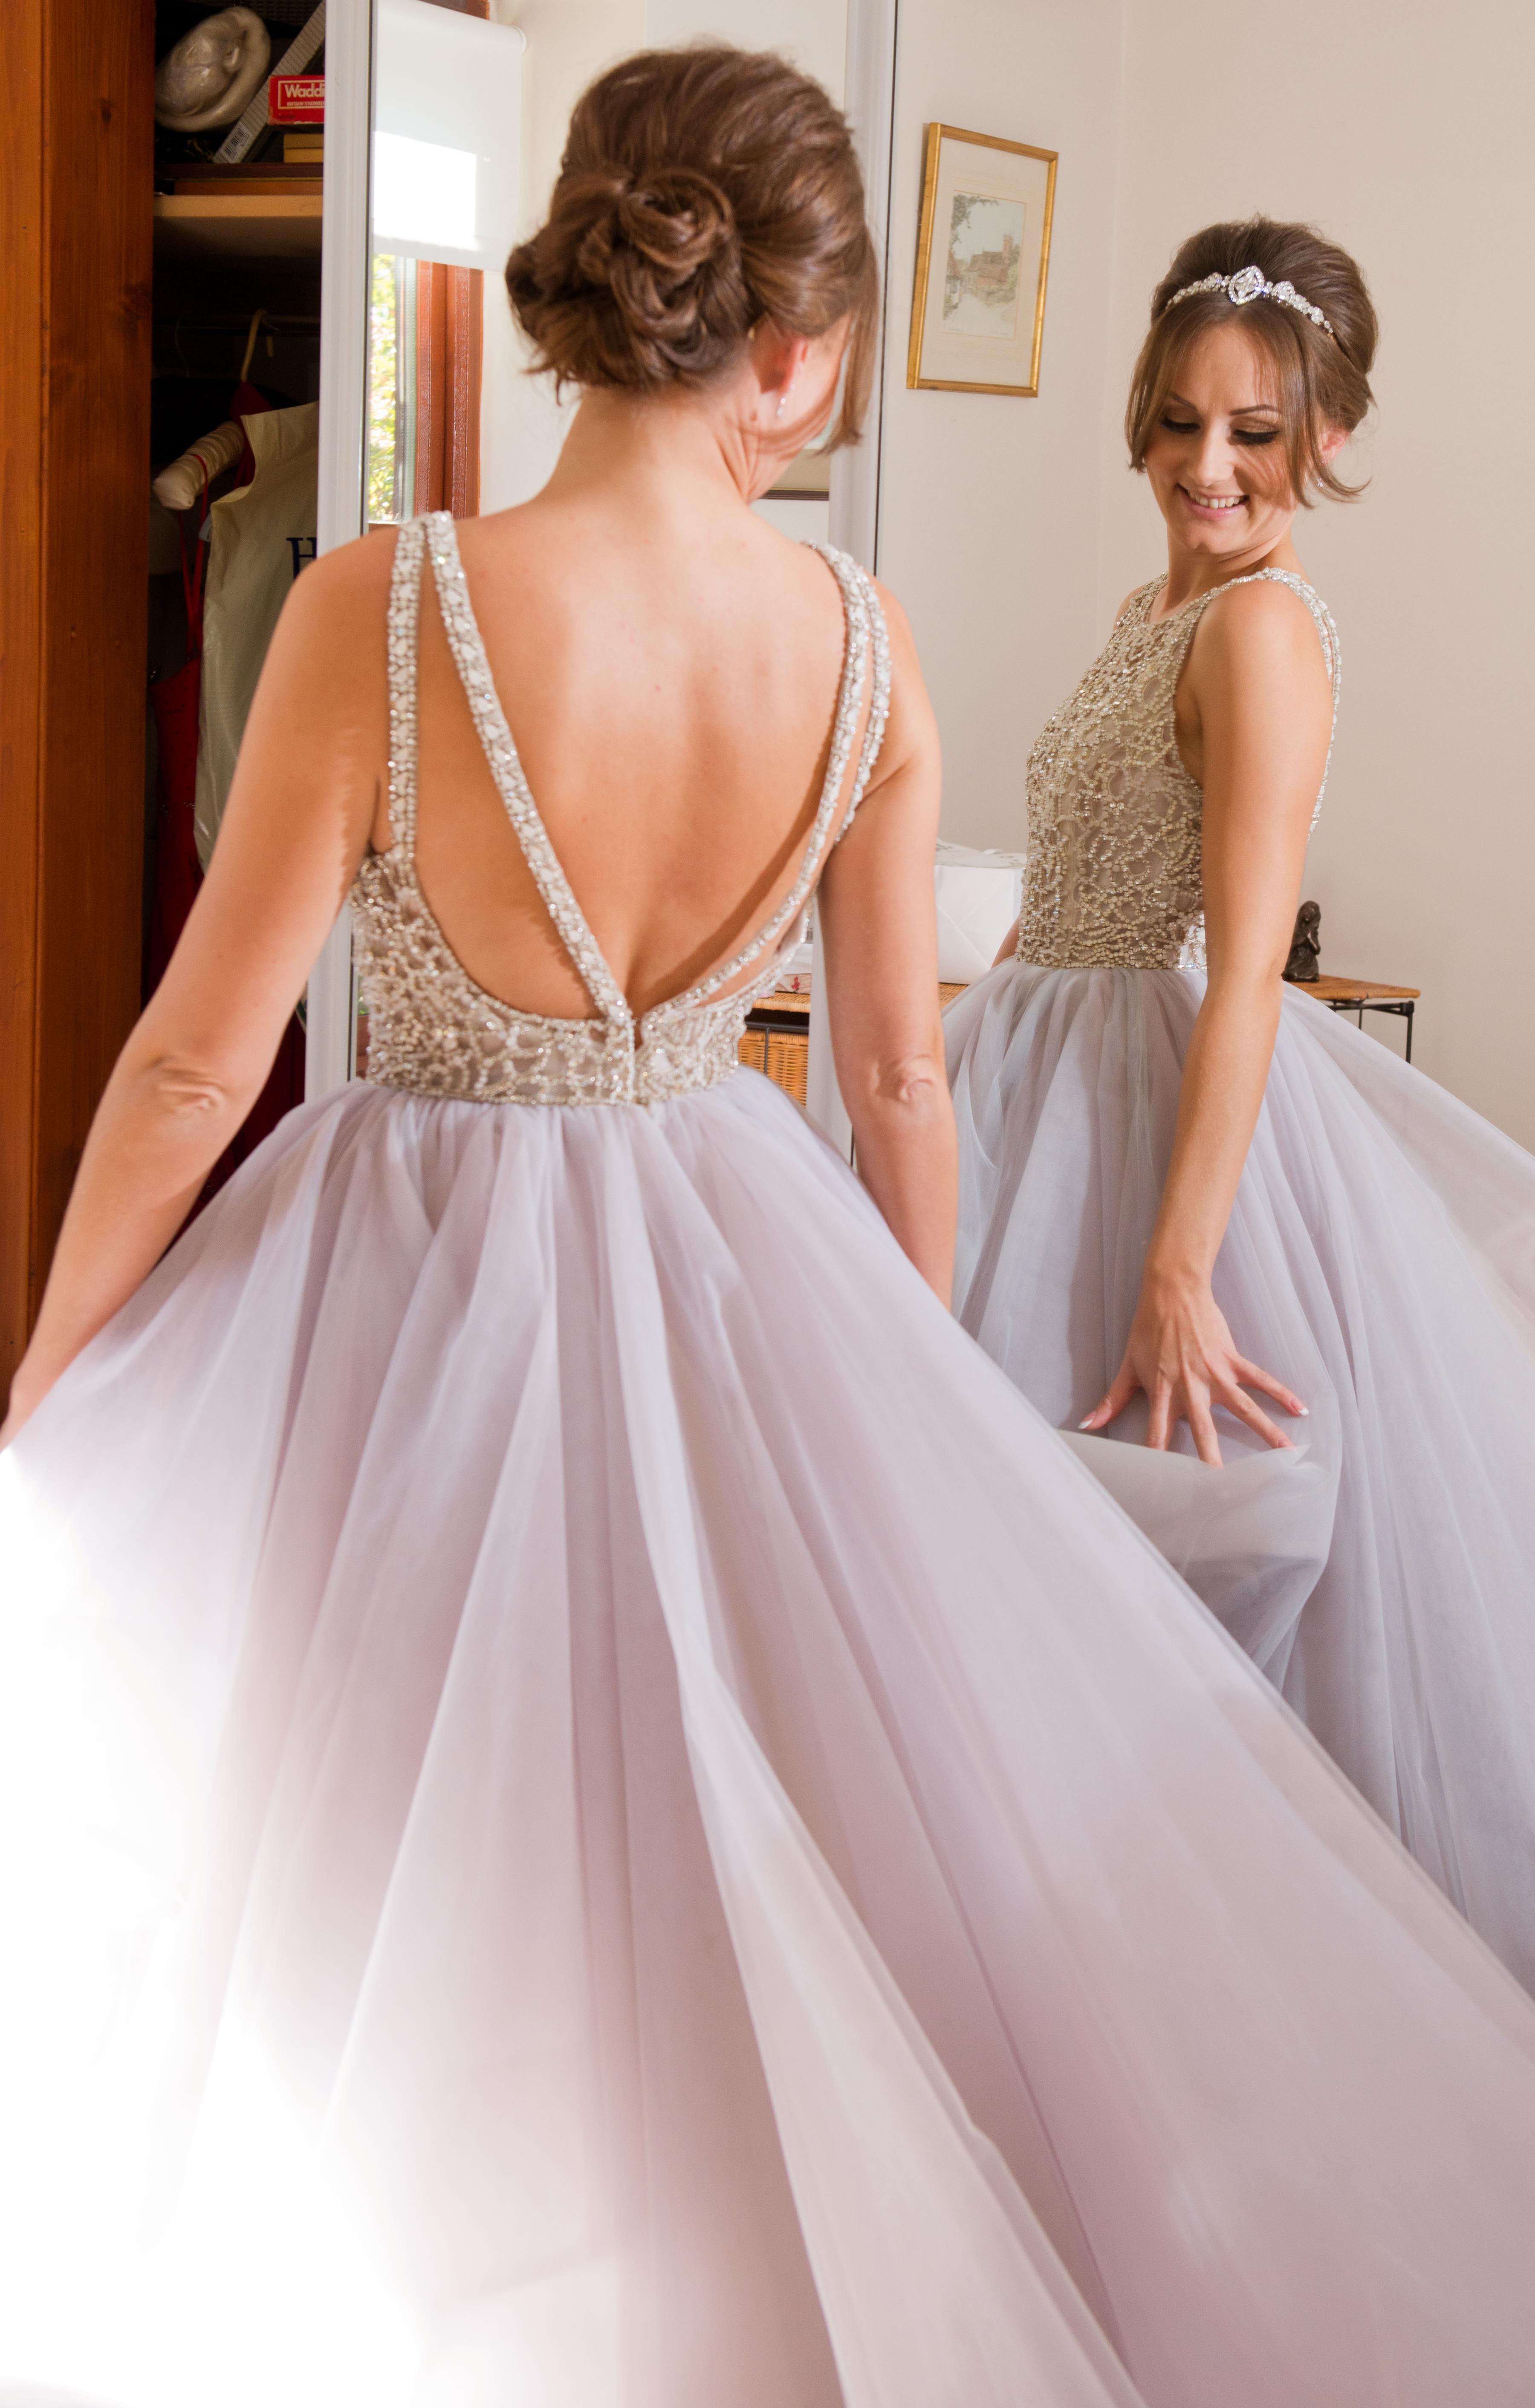 Alice & Elliot_Wedding_Paul Griffiths Photography-110